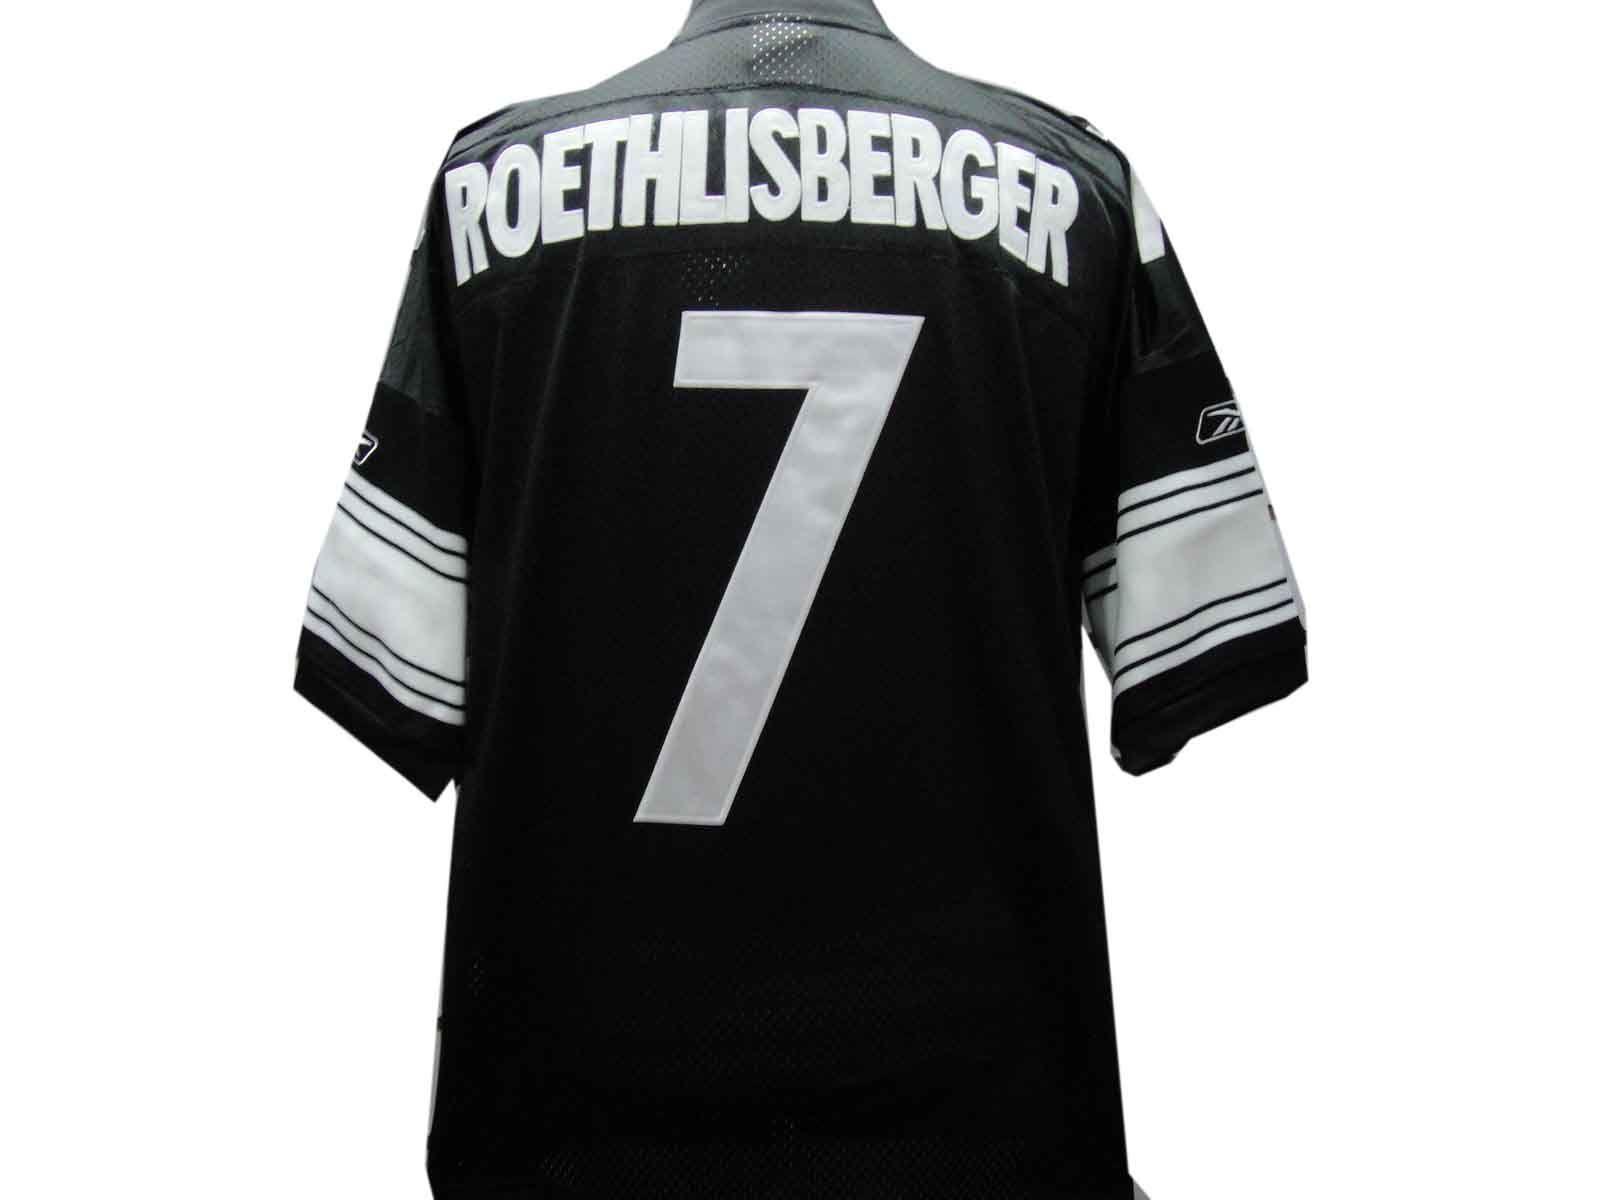 cheap priced nfl jerseys